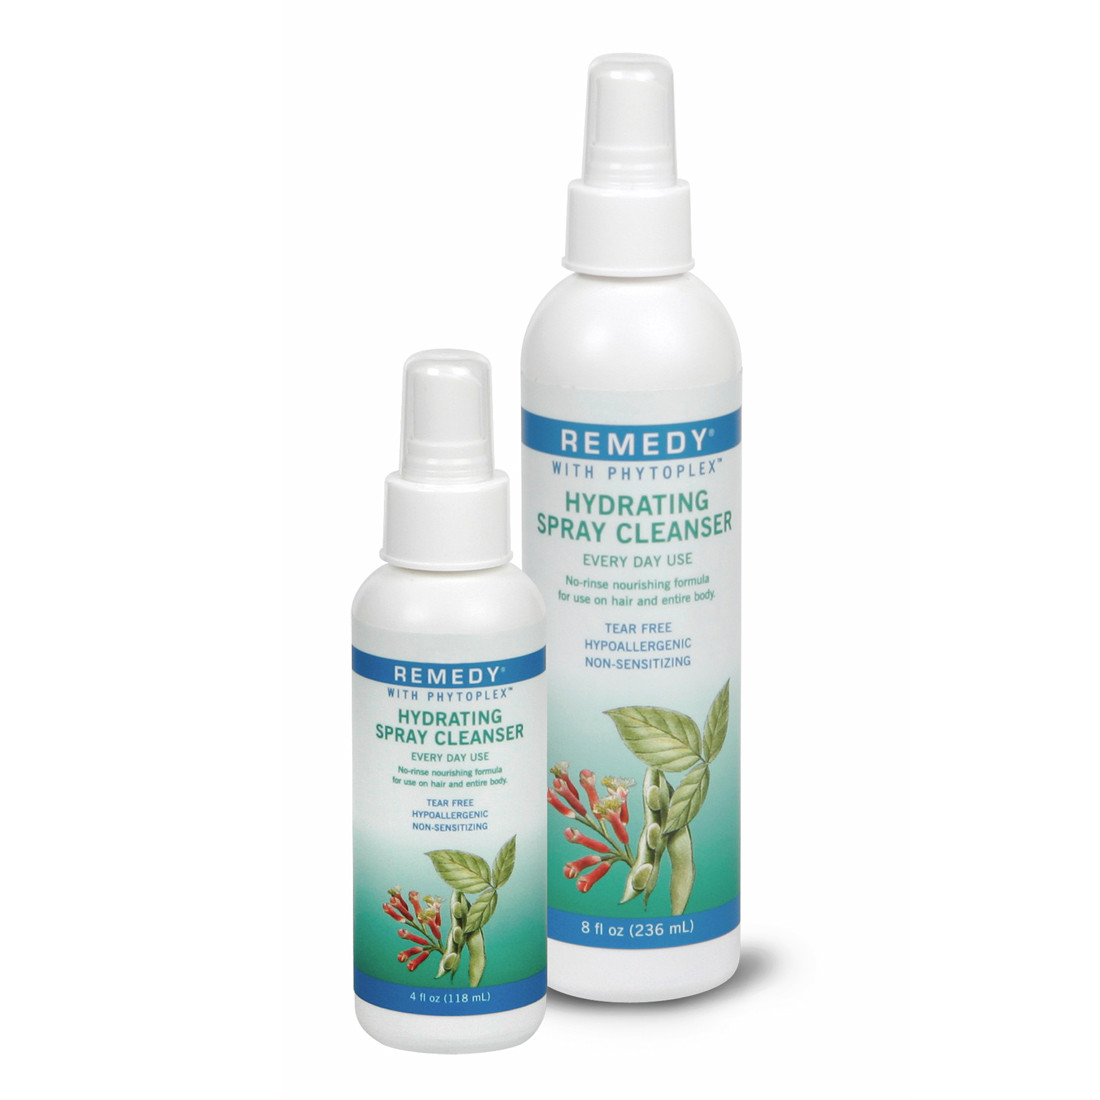 Remedy Spray Cleanser